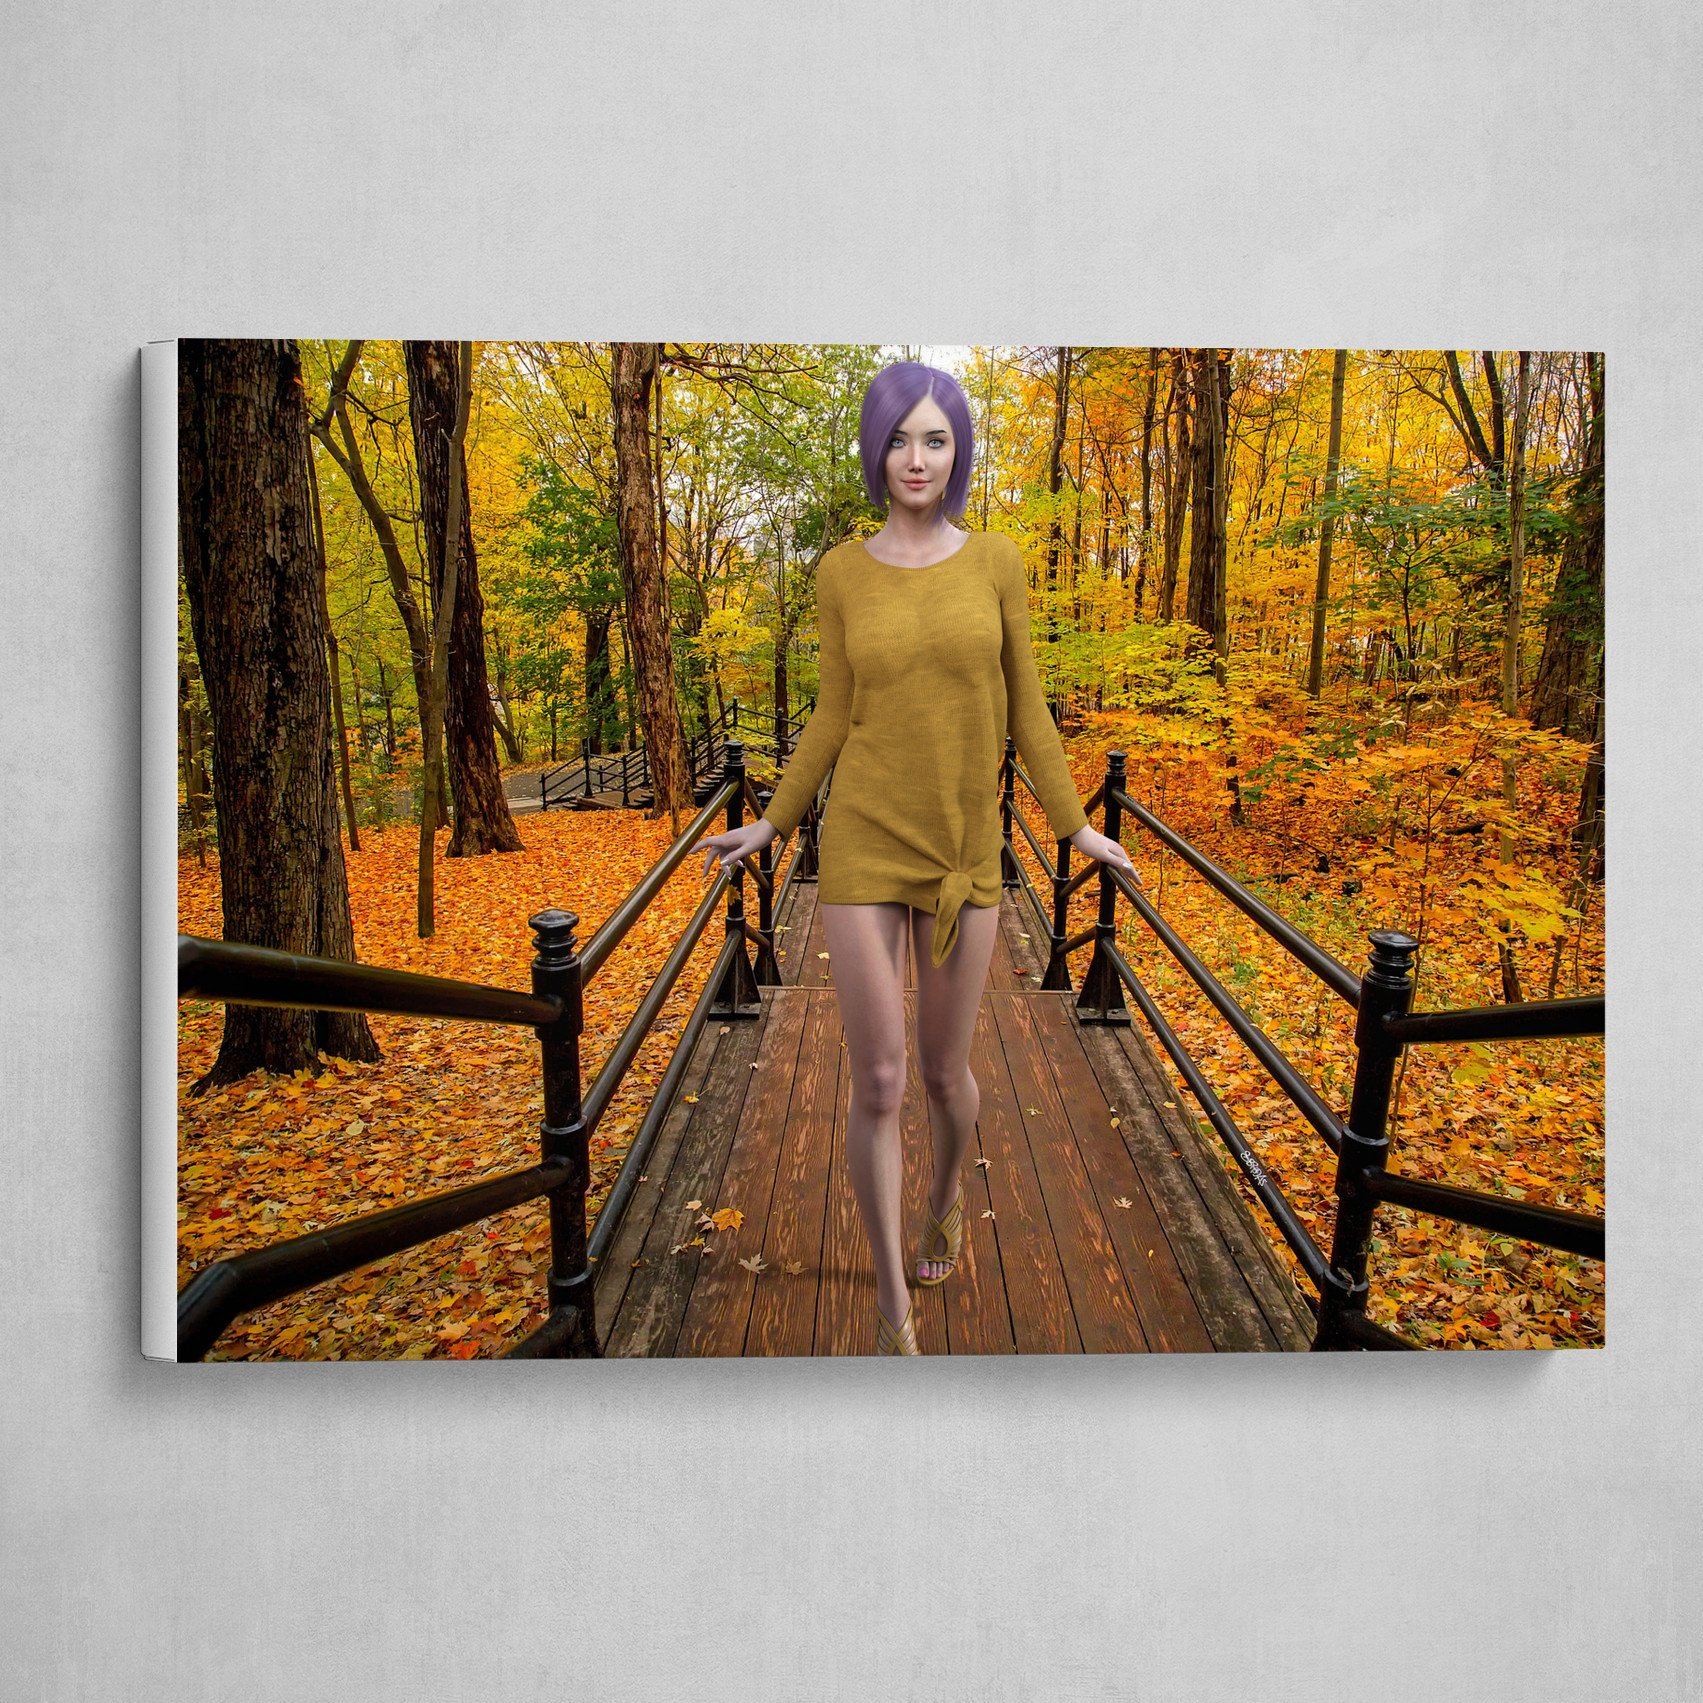 Serah Fei - The walk of Autumn